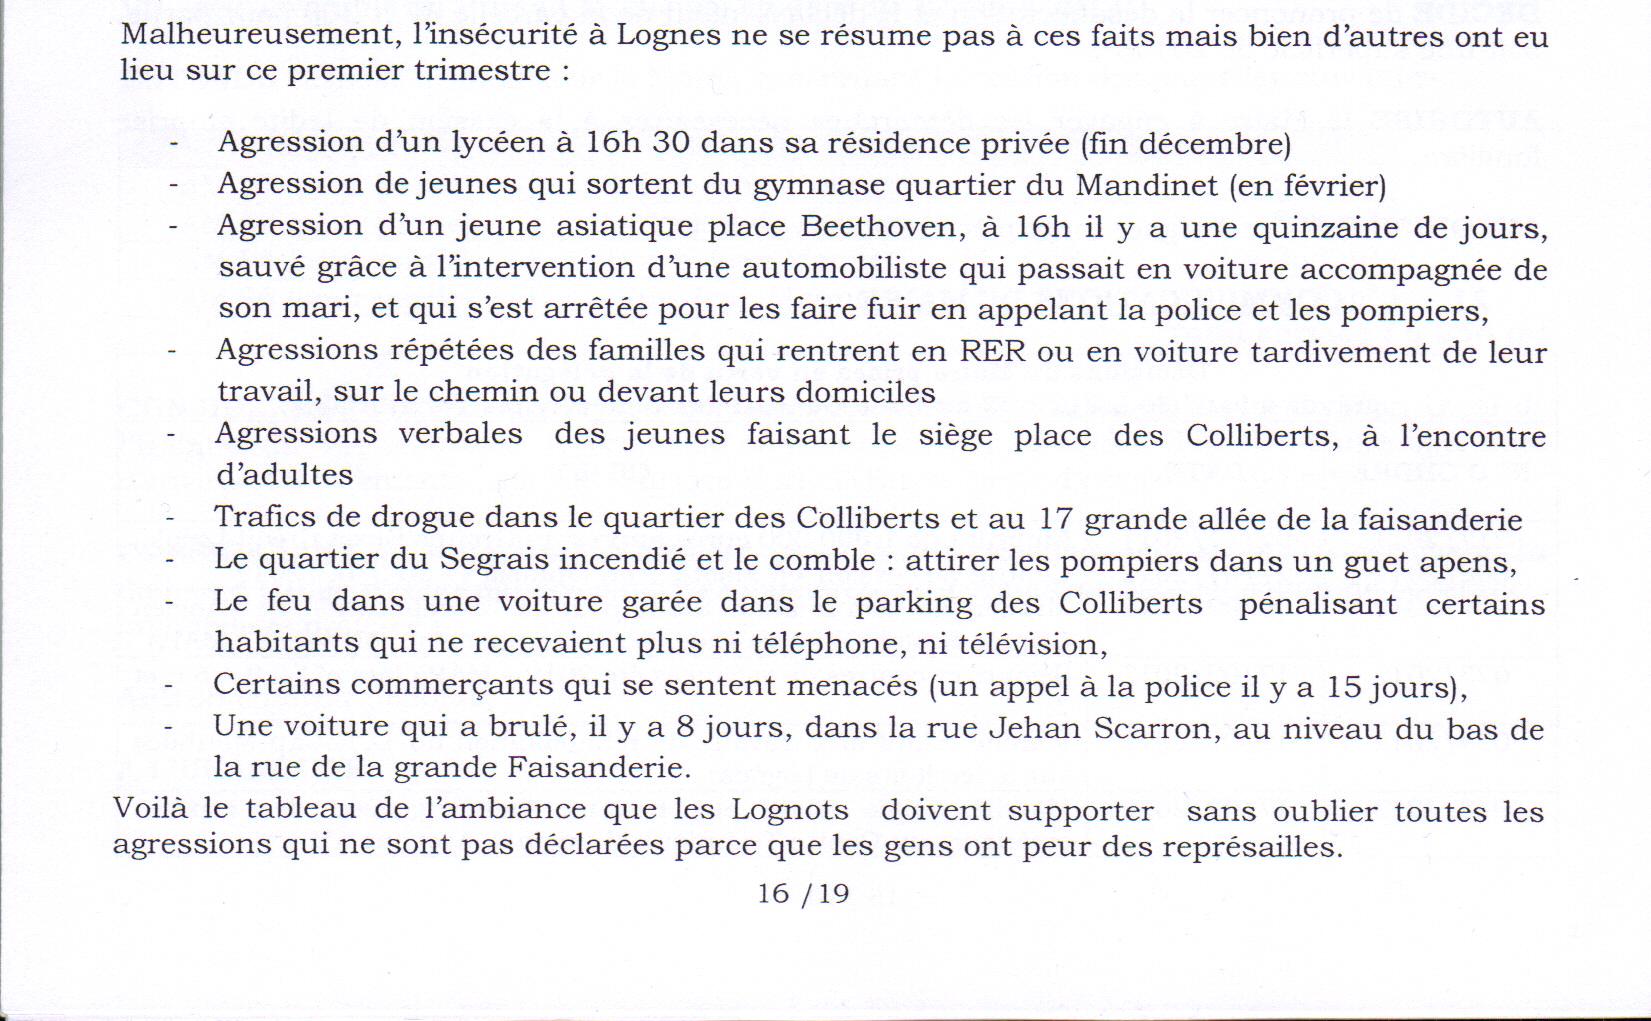 lognes-securite-compte-rendu-conseil-municipal-du-11_04_12.JPG